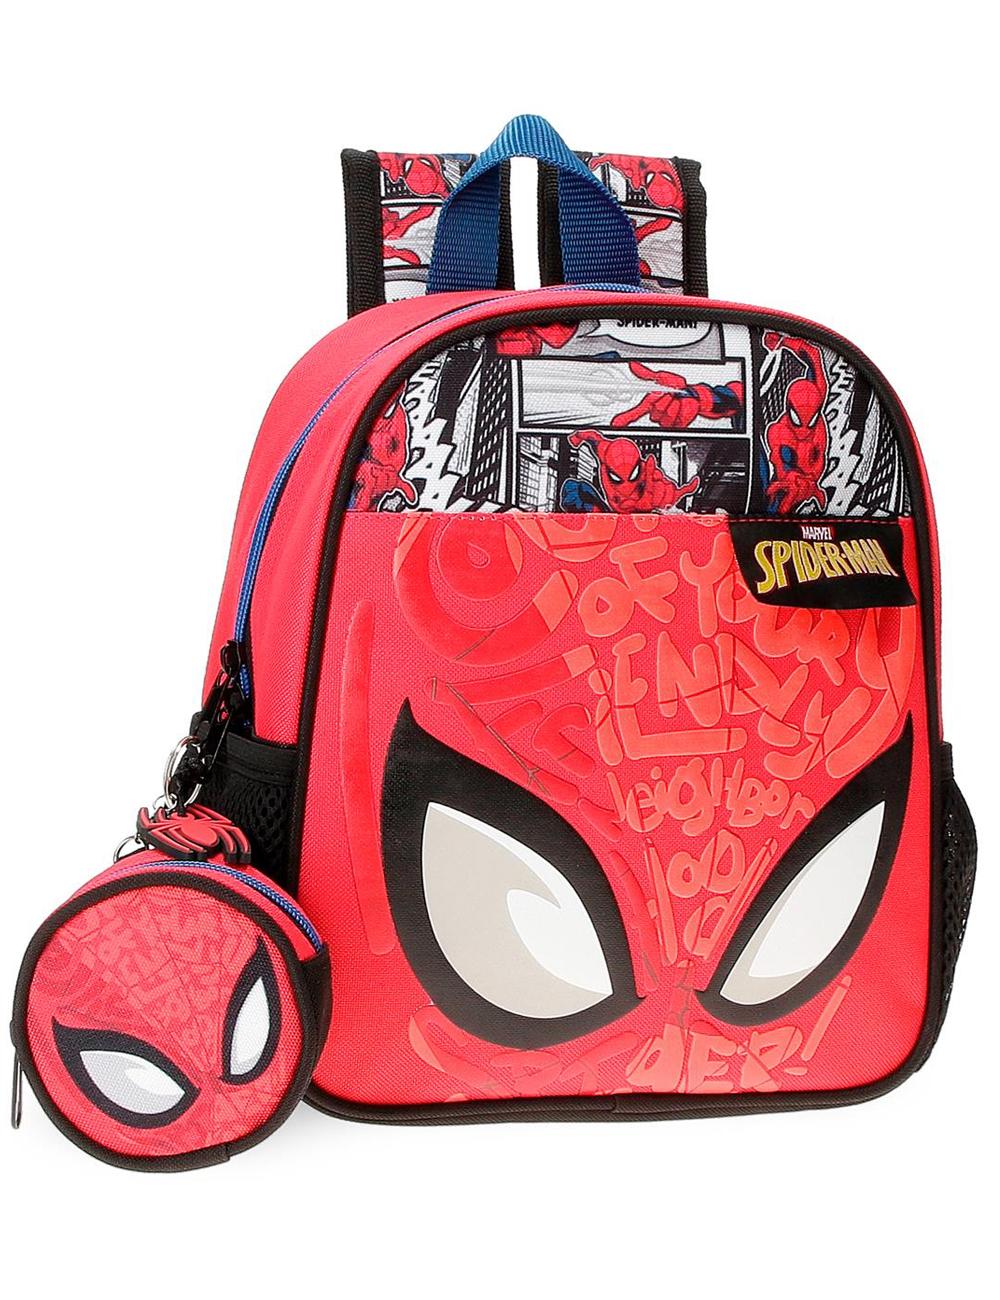 2252021 Mochila 25cm Spiderman Comic